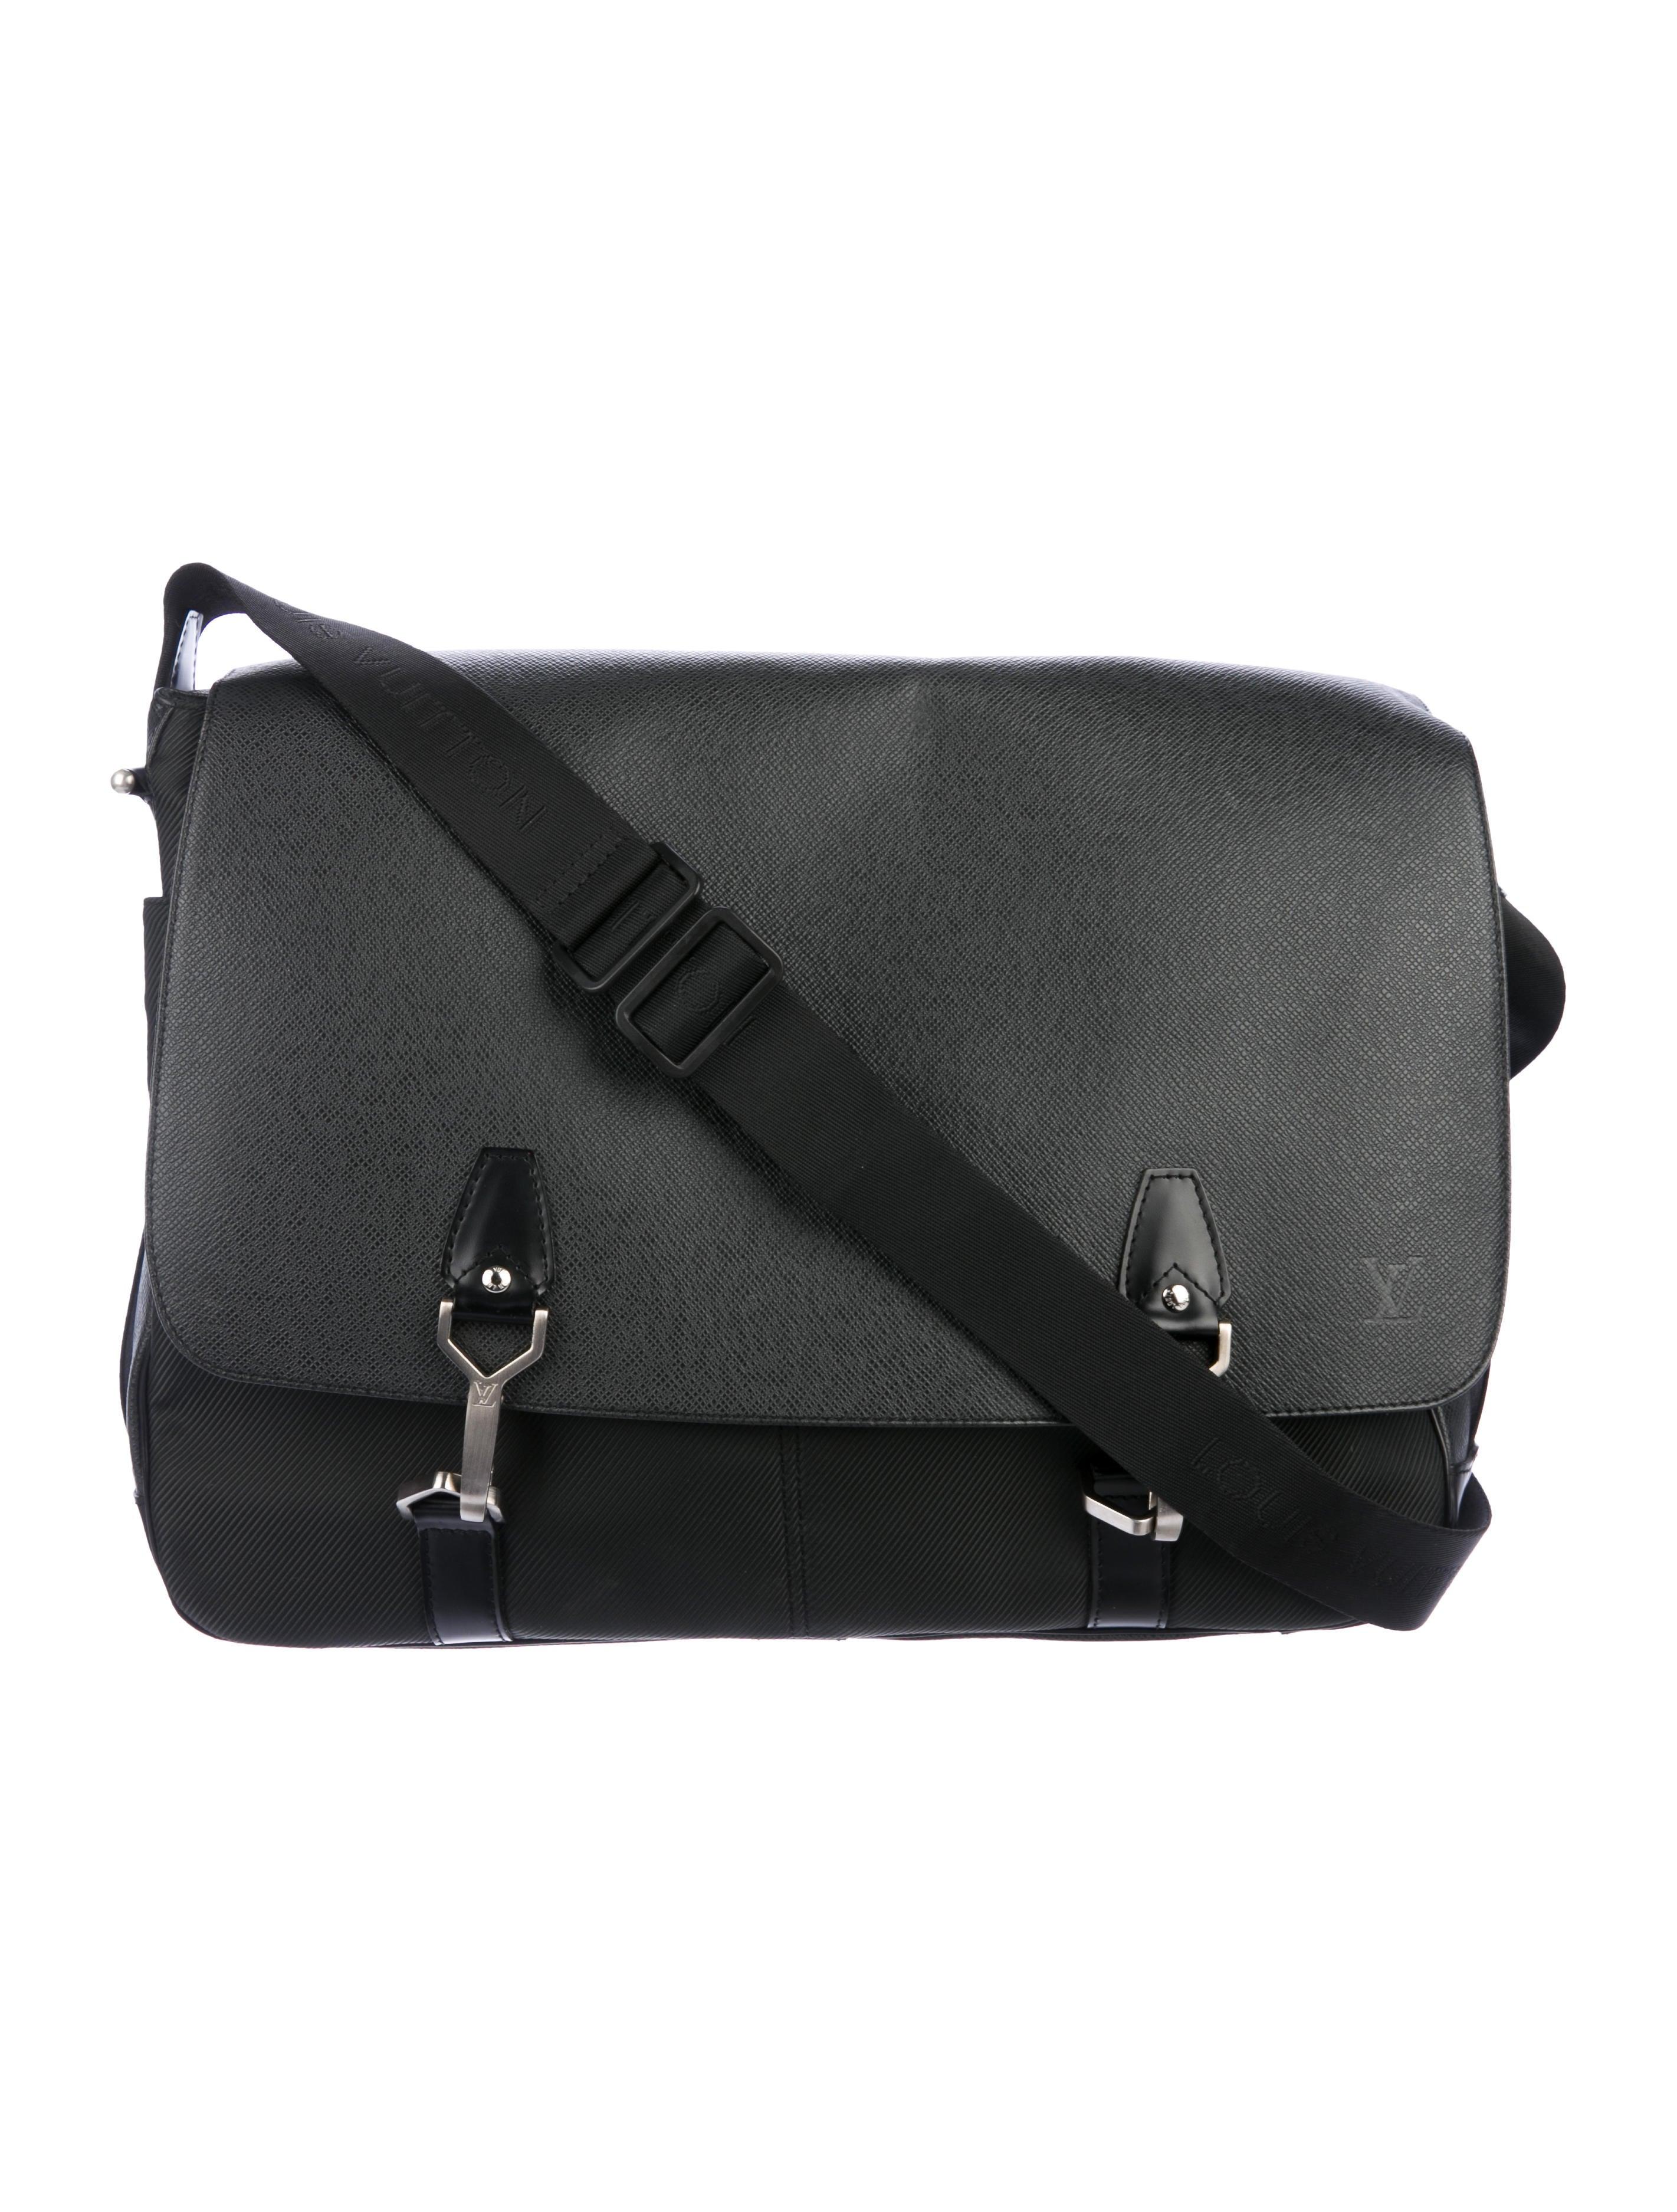 4b4bb68622e6 Louis Vuitton Taiga Dersou Messenger Bag - Bags - LOU193211